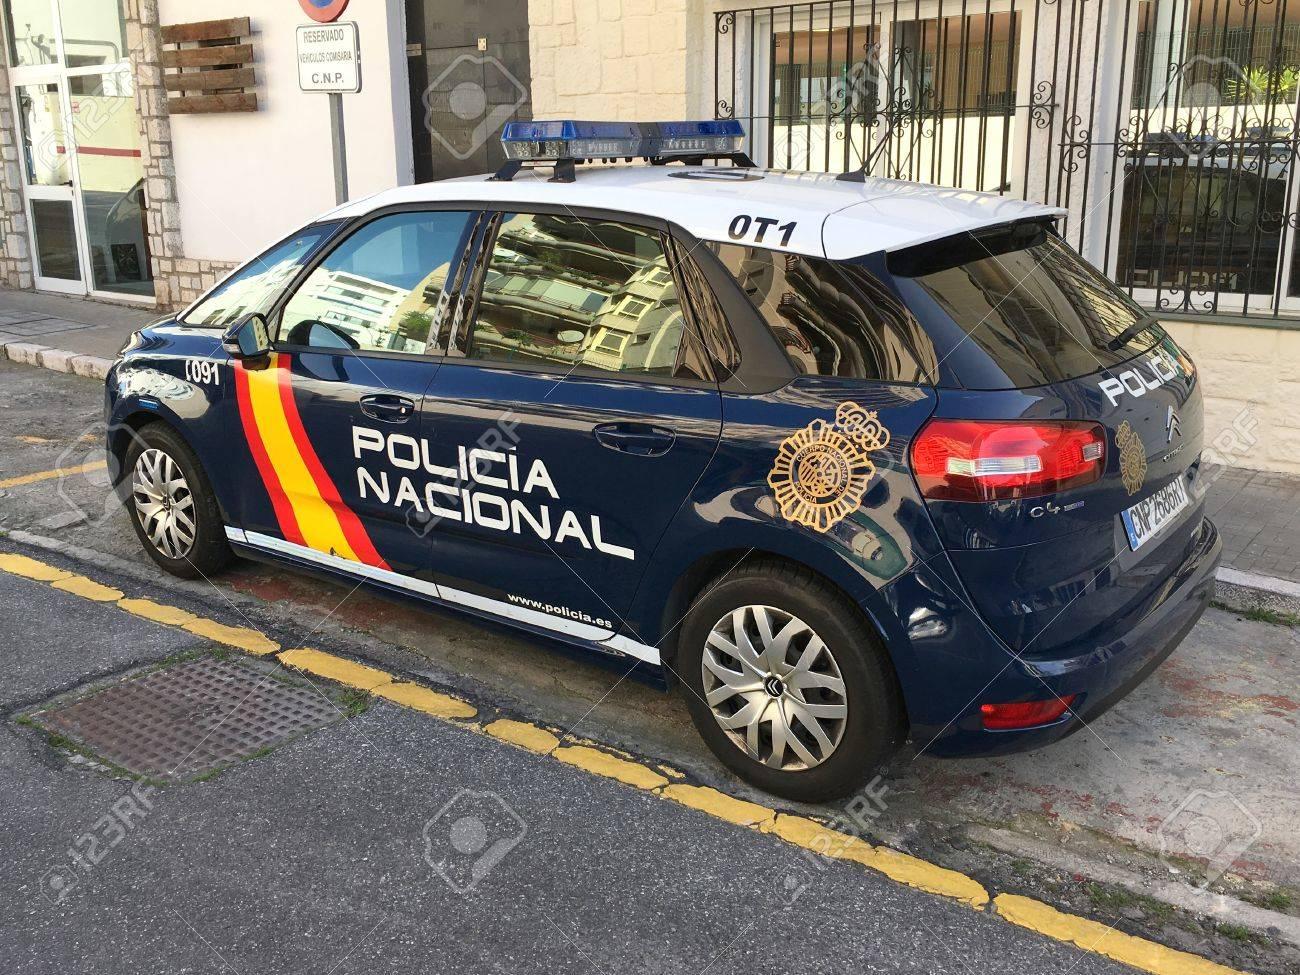 [Photos] Les citroen de la police 72615569-blue-spanish-national-police-car-citroen-c4